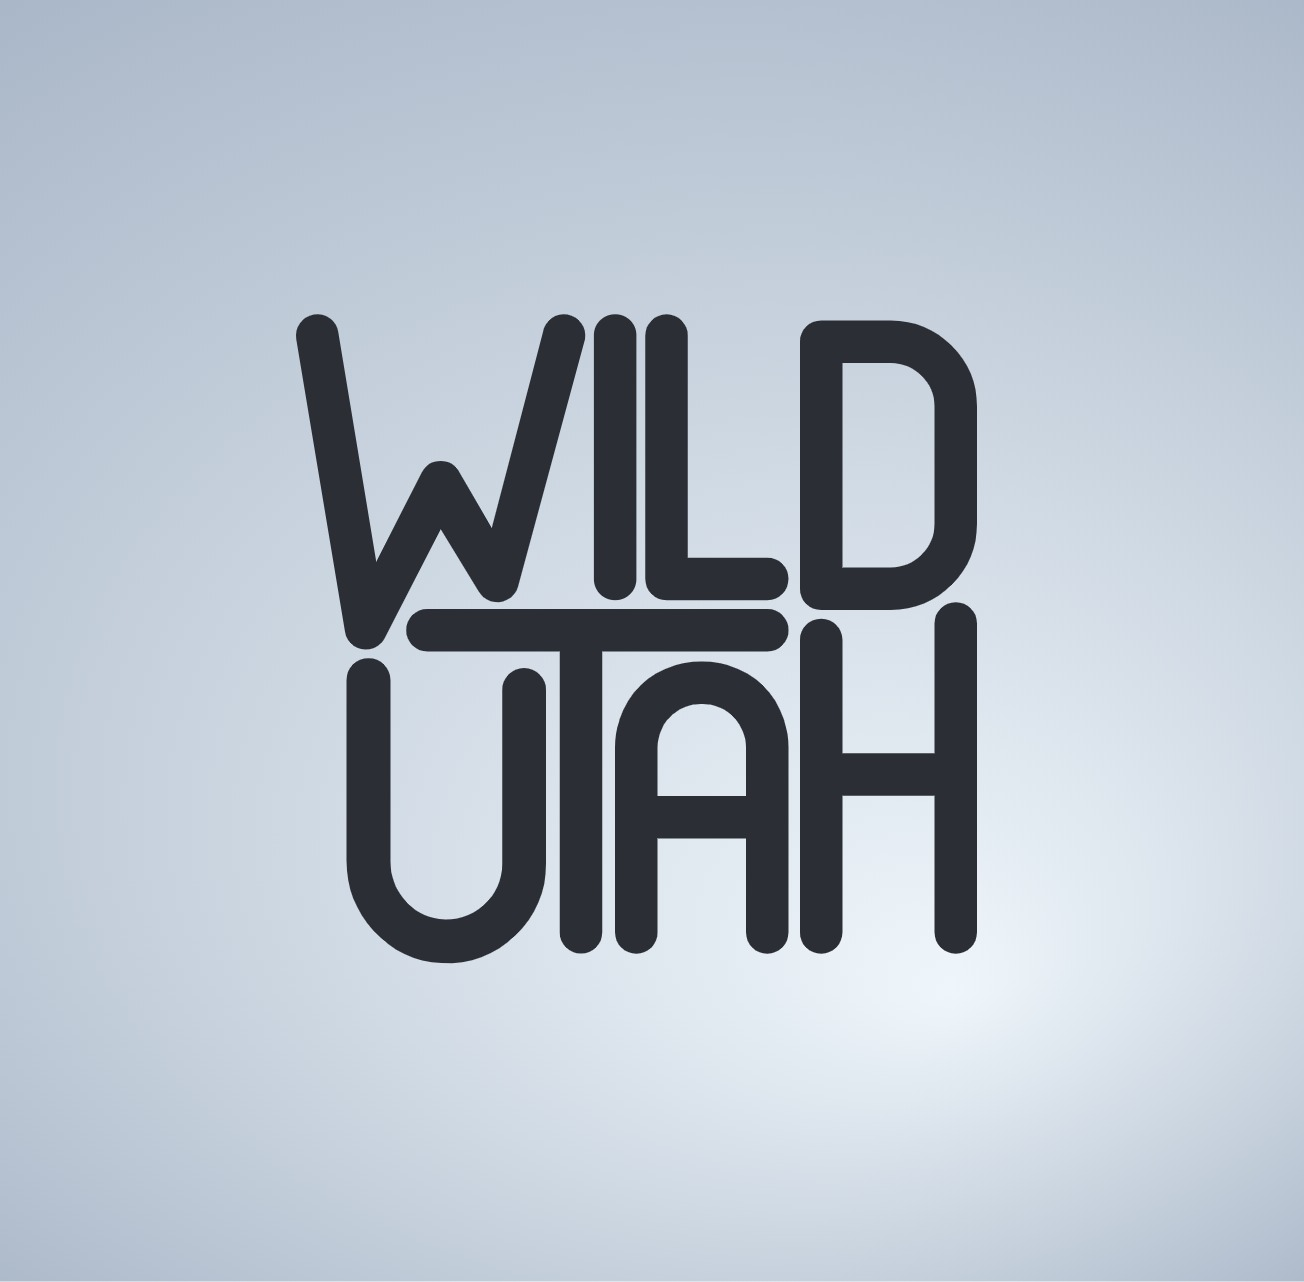 Wild Utah Logo Design